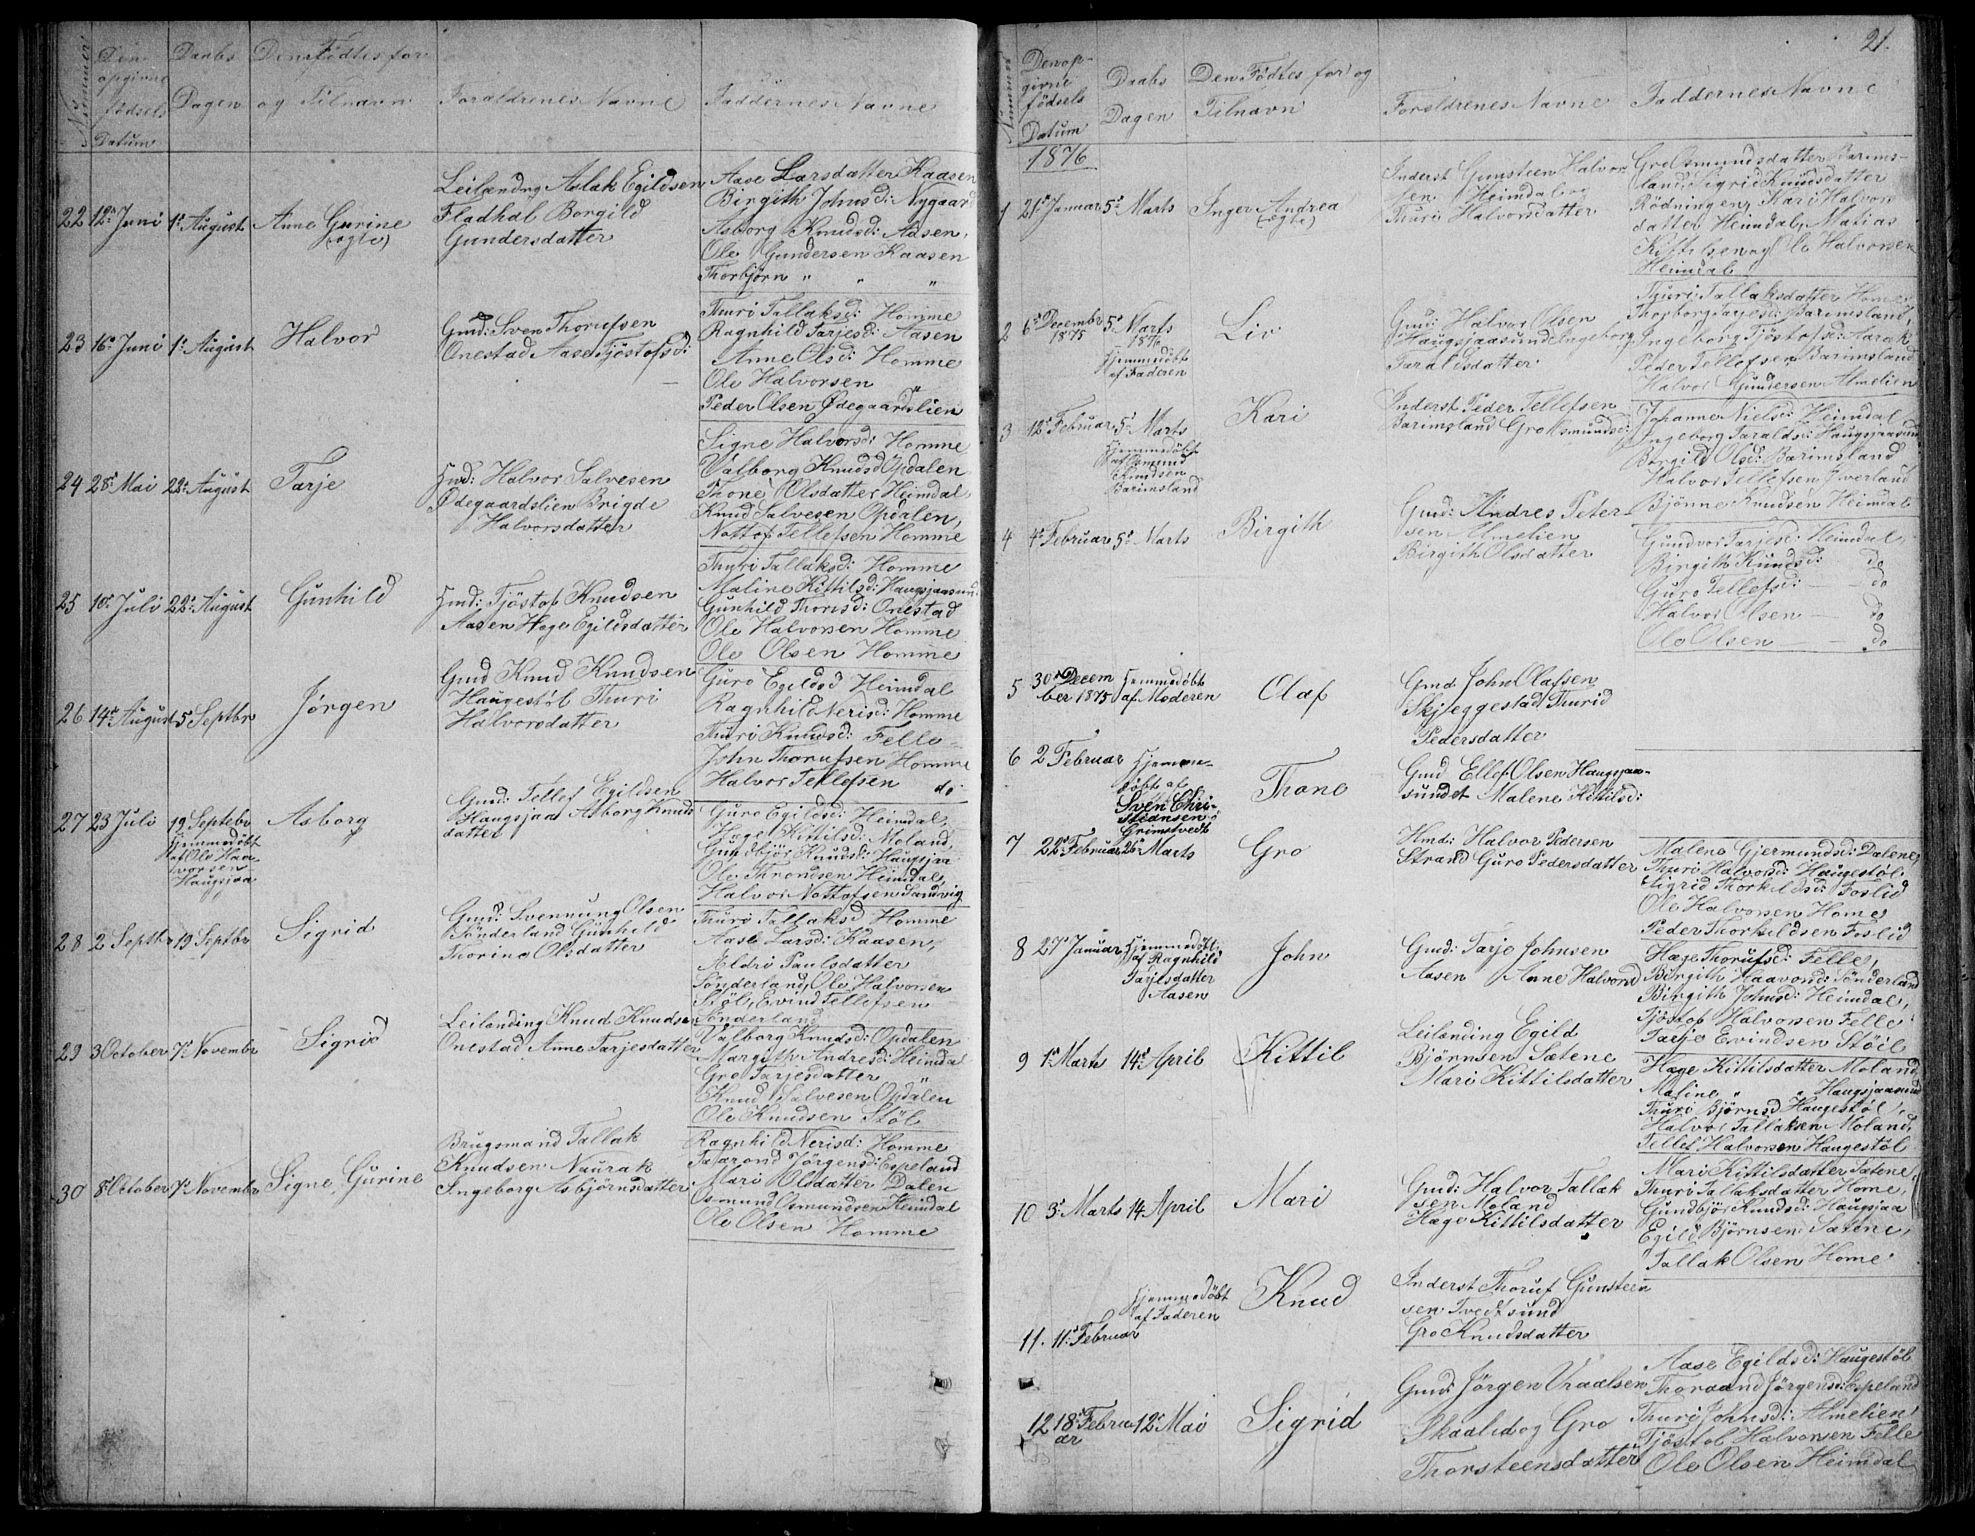 SAKO, Nissedal kirkebøker, G/Gb/L0002: Klokkerbok nr. II 2, 1863-1892, s. 21